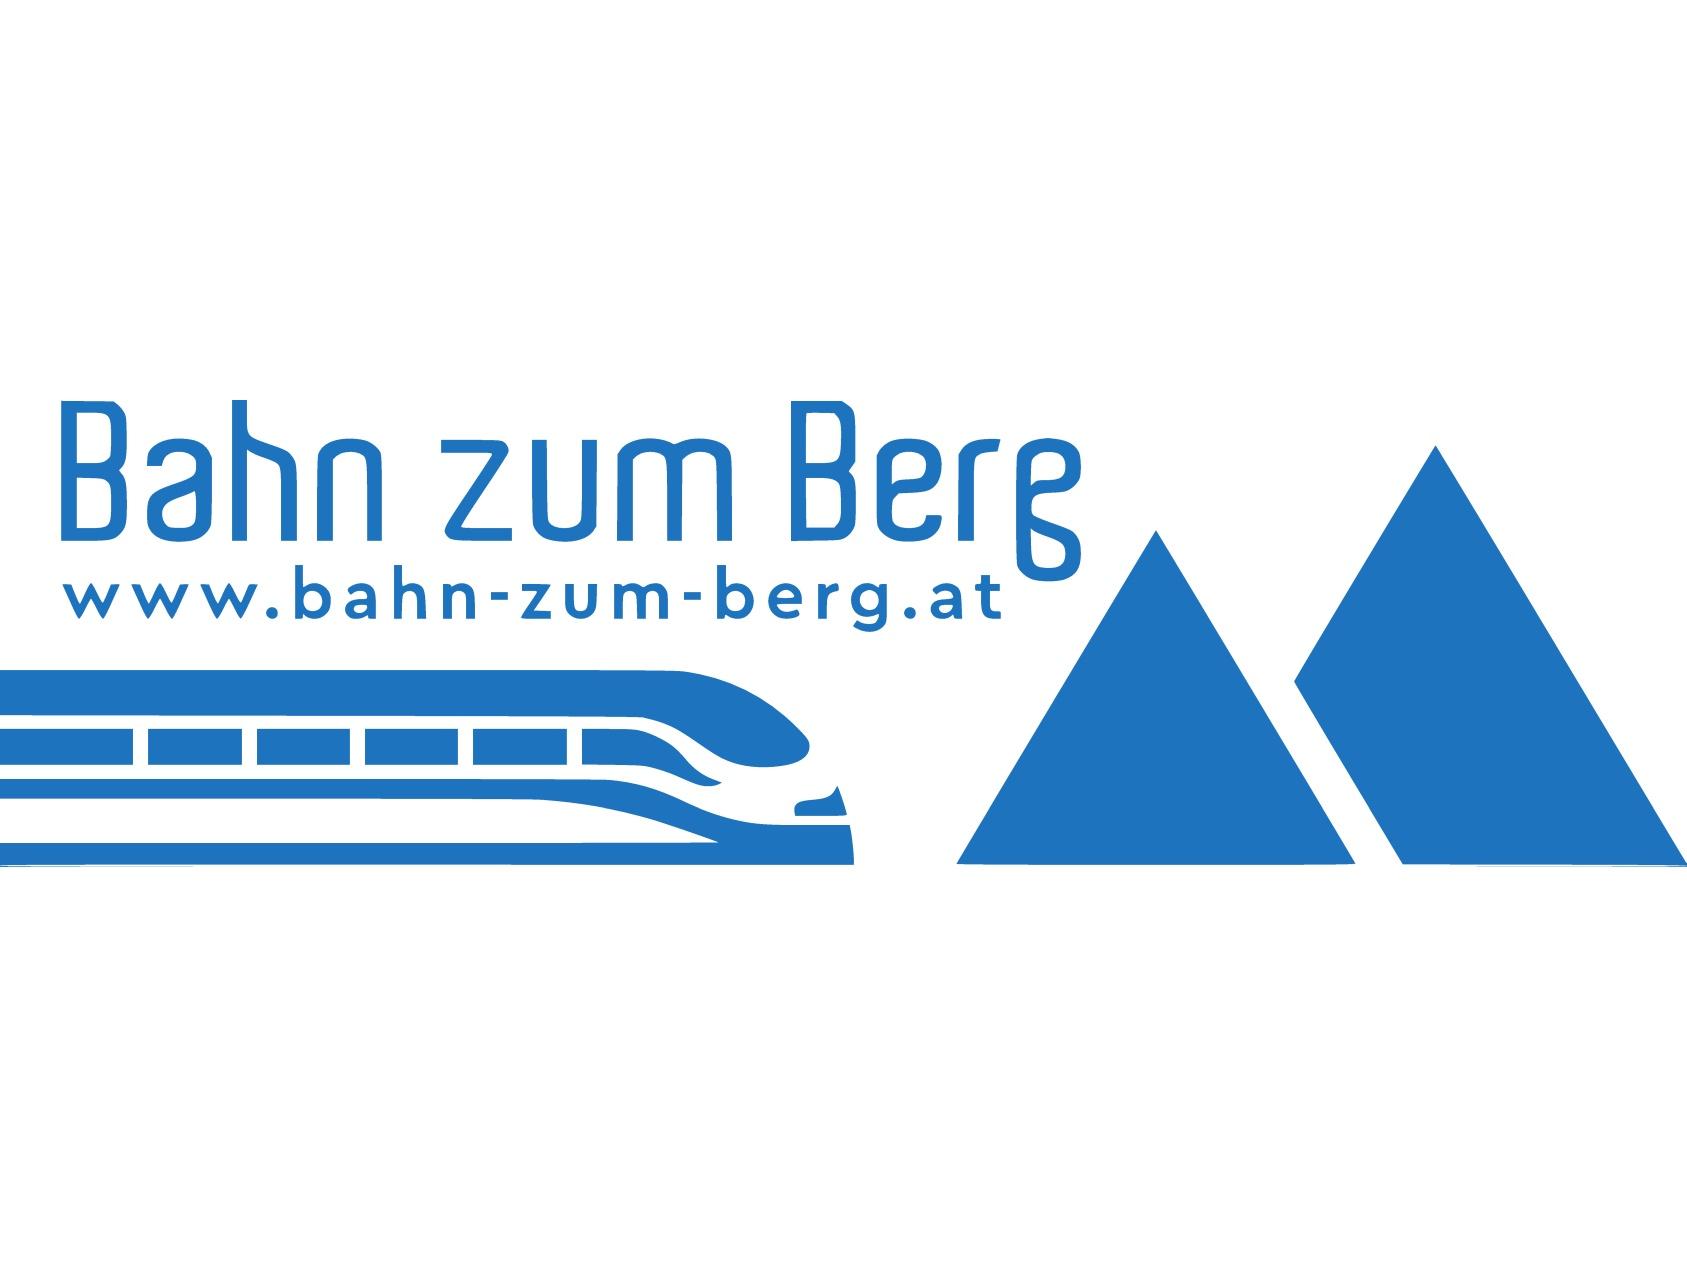 Bahn zum Berg